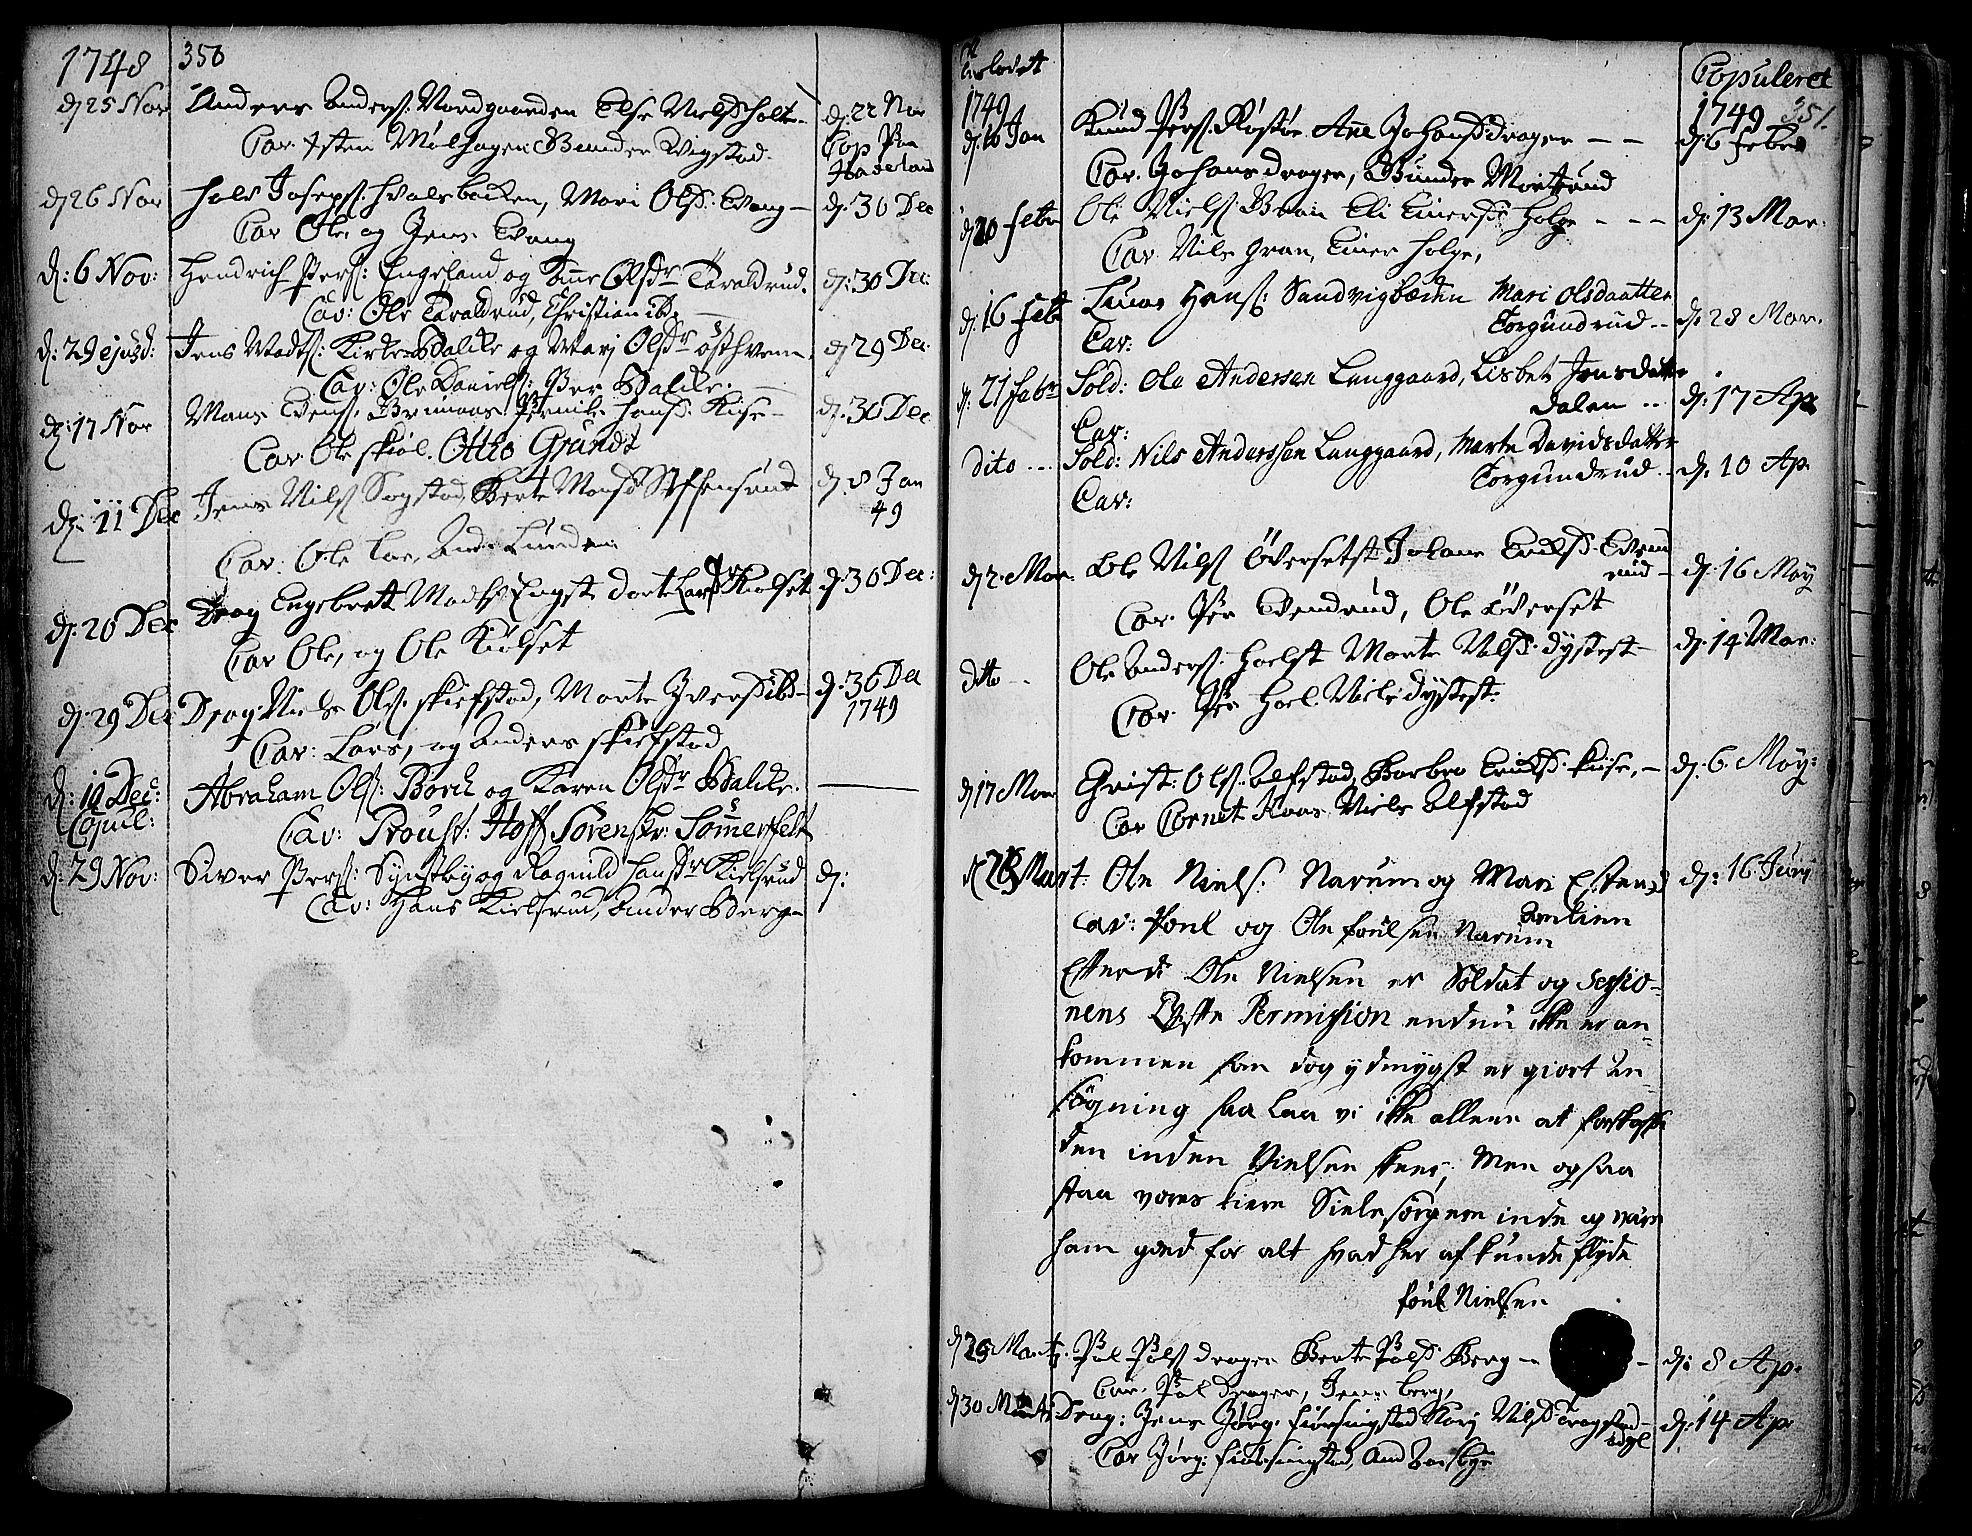 SAH, Toten prestekontor, Ministerialbok nr. 3, 1734-1751, s. 350-351